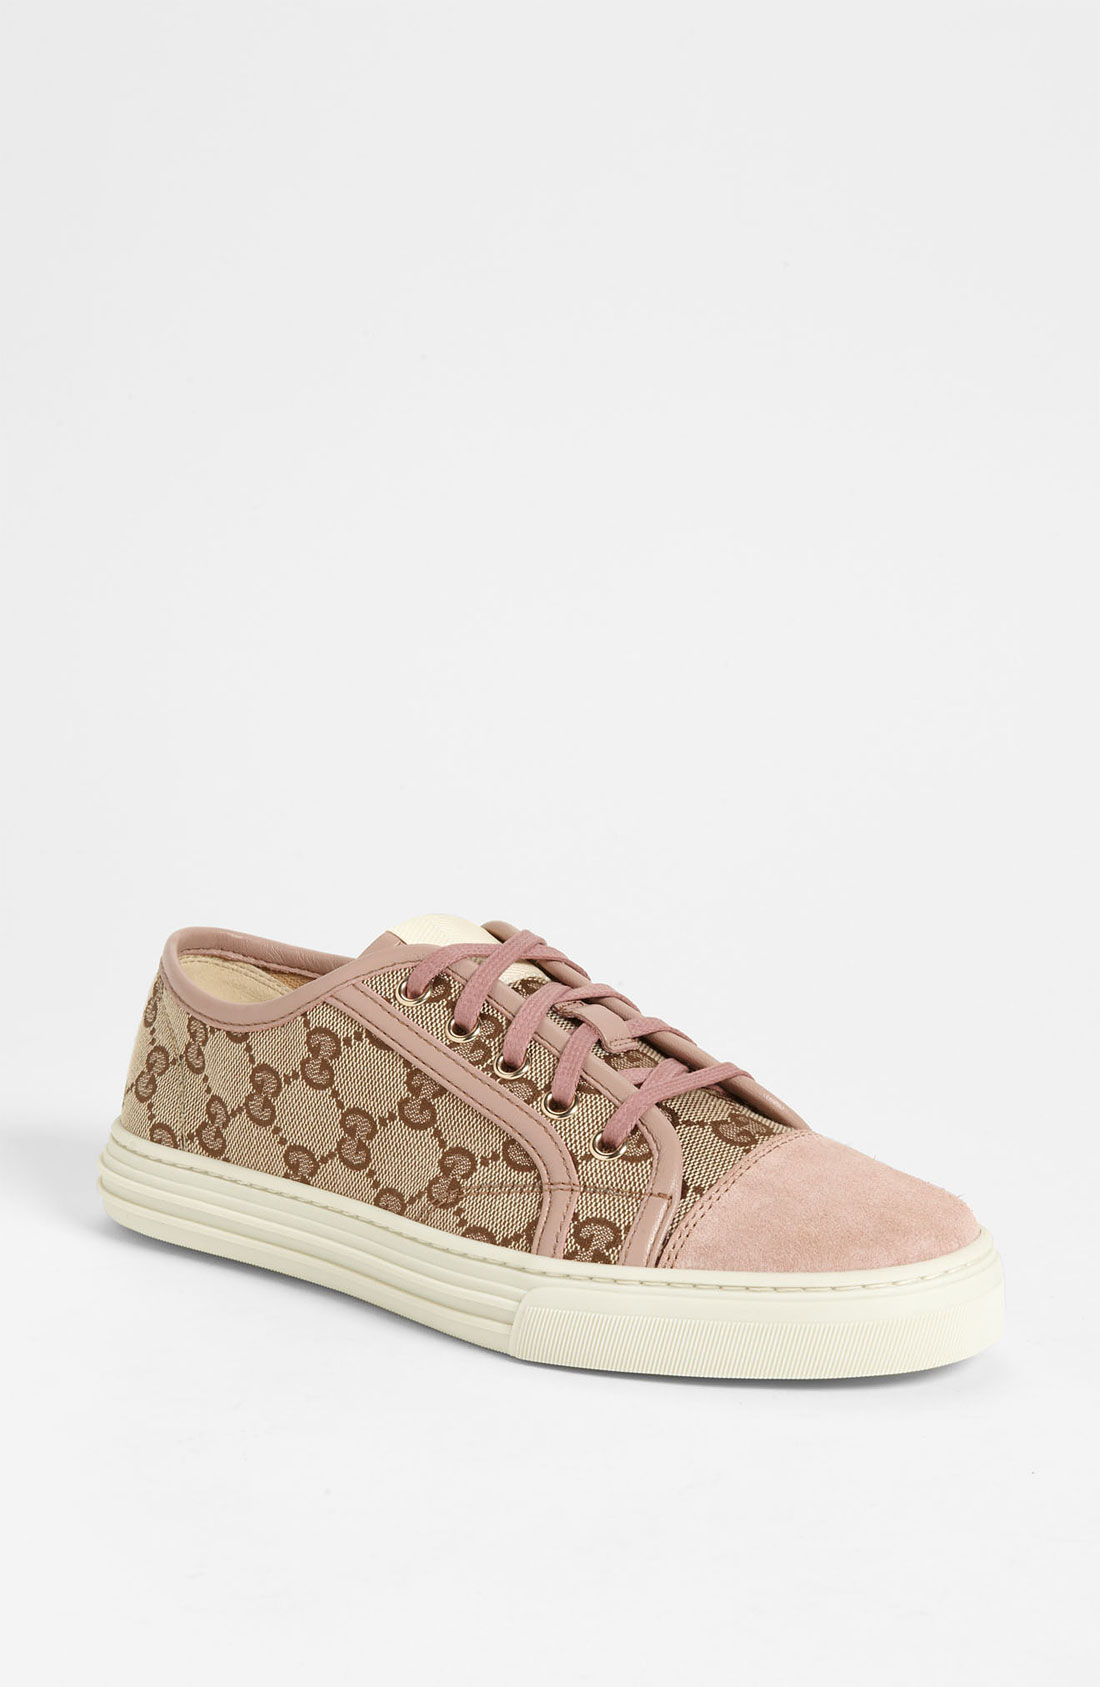 Gucci California Low Sneaker in Natural   Lyst